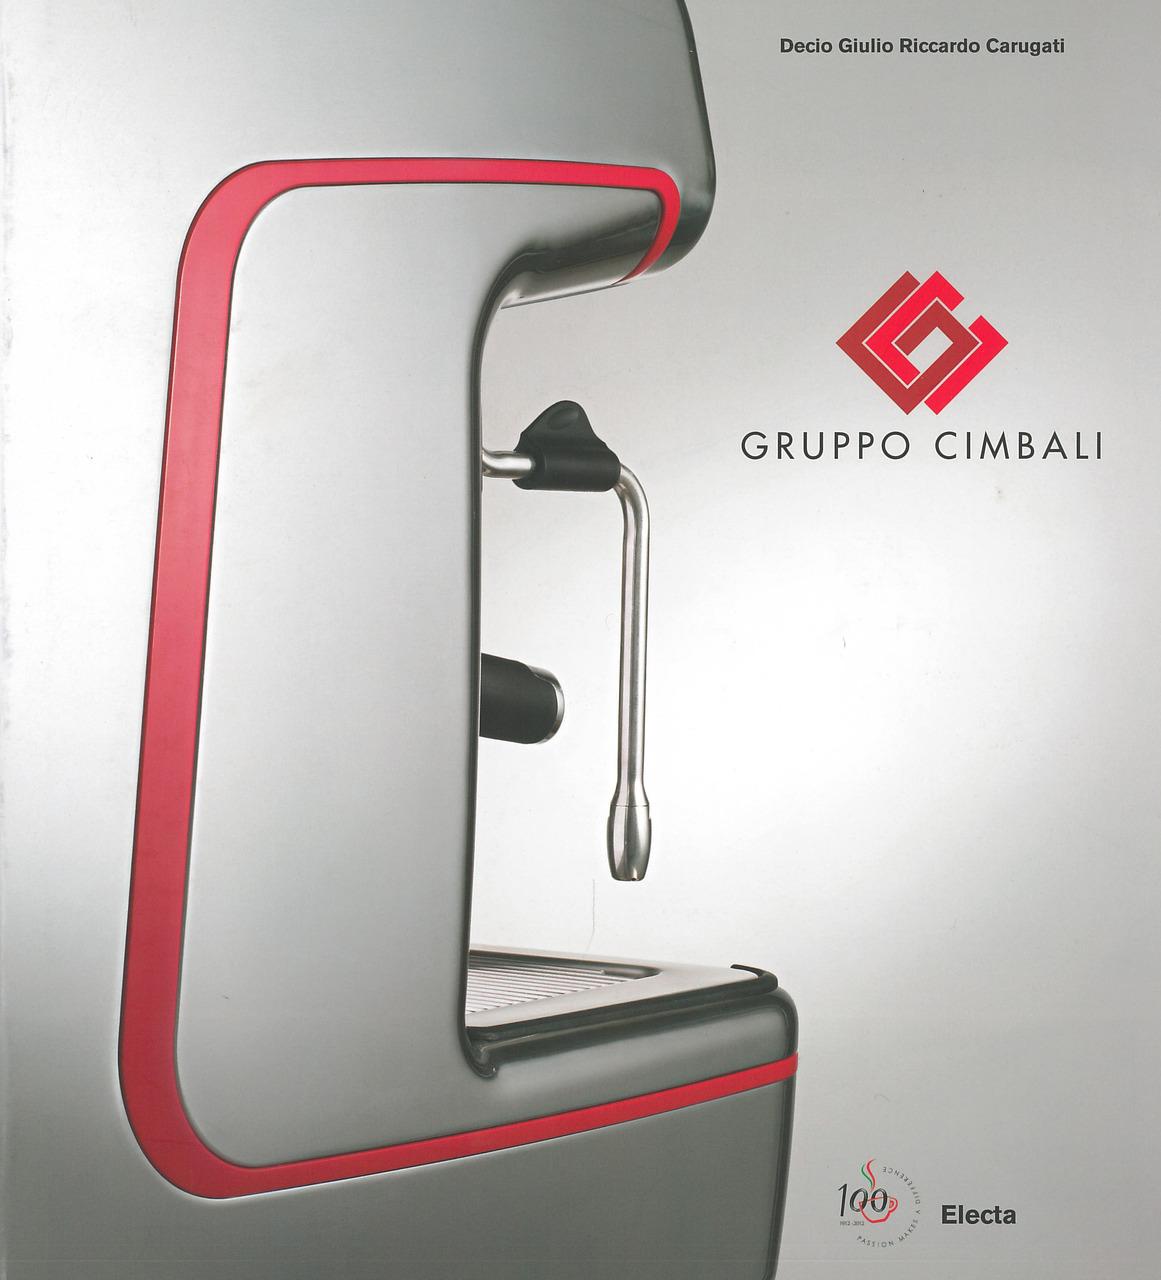 CARUGATI Riccardo, GRUPPO CIMBALI, Verona, Mondadori Electa, 2012